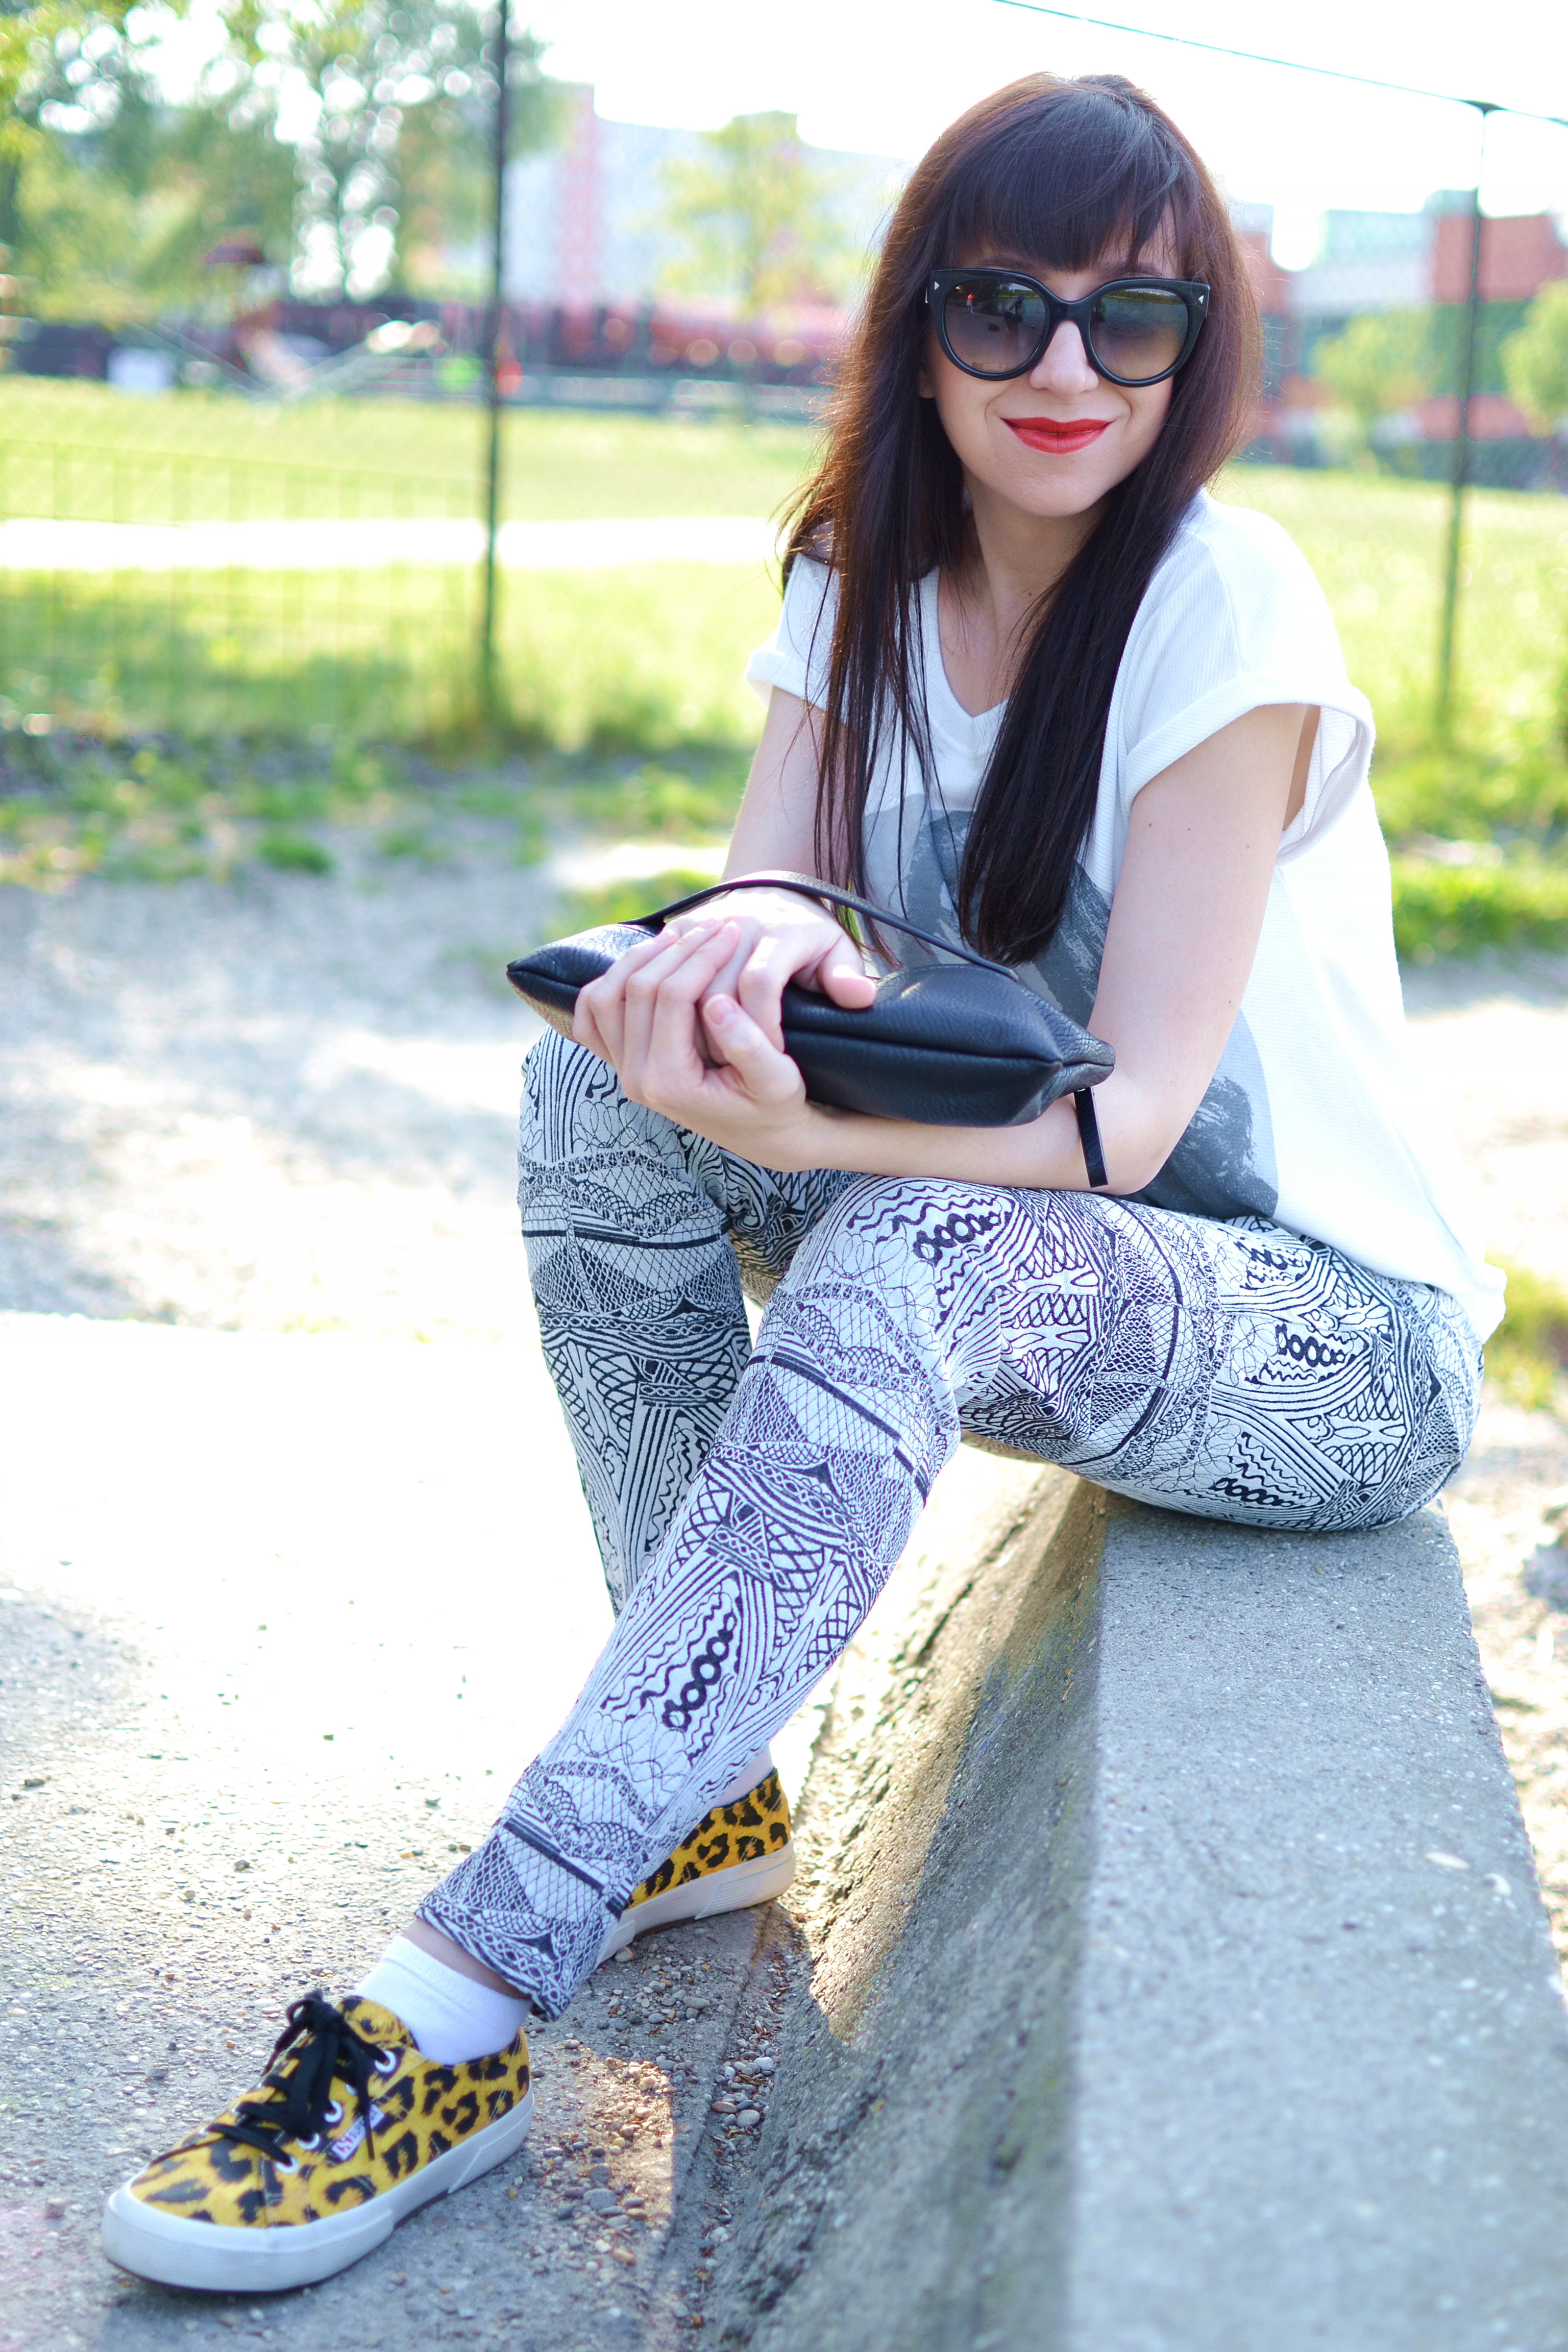 PRVÝ DOJEM_Katharine-fashion is beautiful_Tenisky Superga_Katarína Jakubčová_Fashion blogger